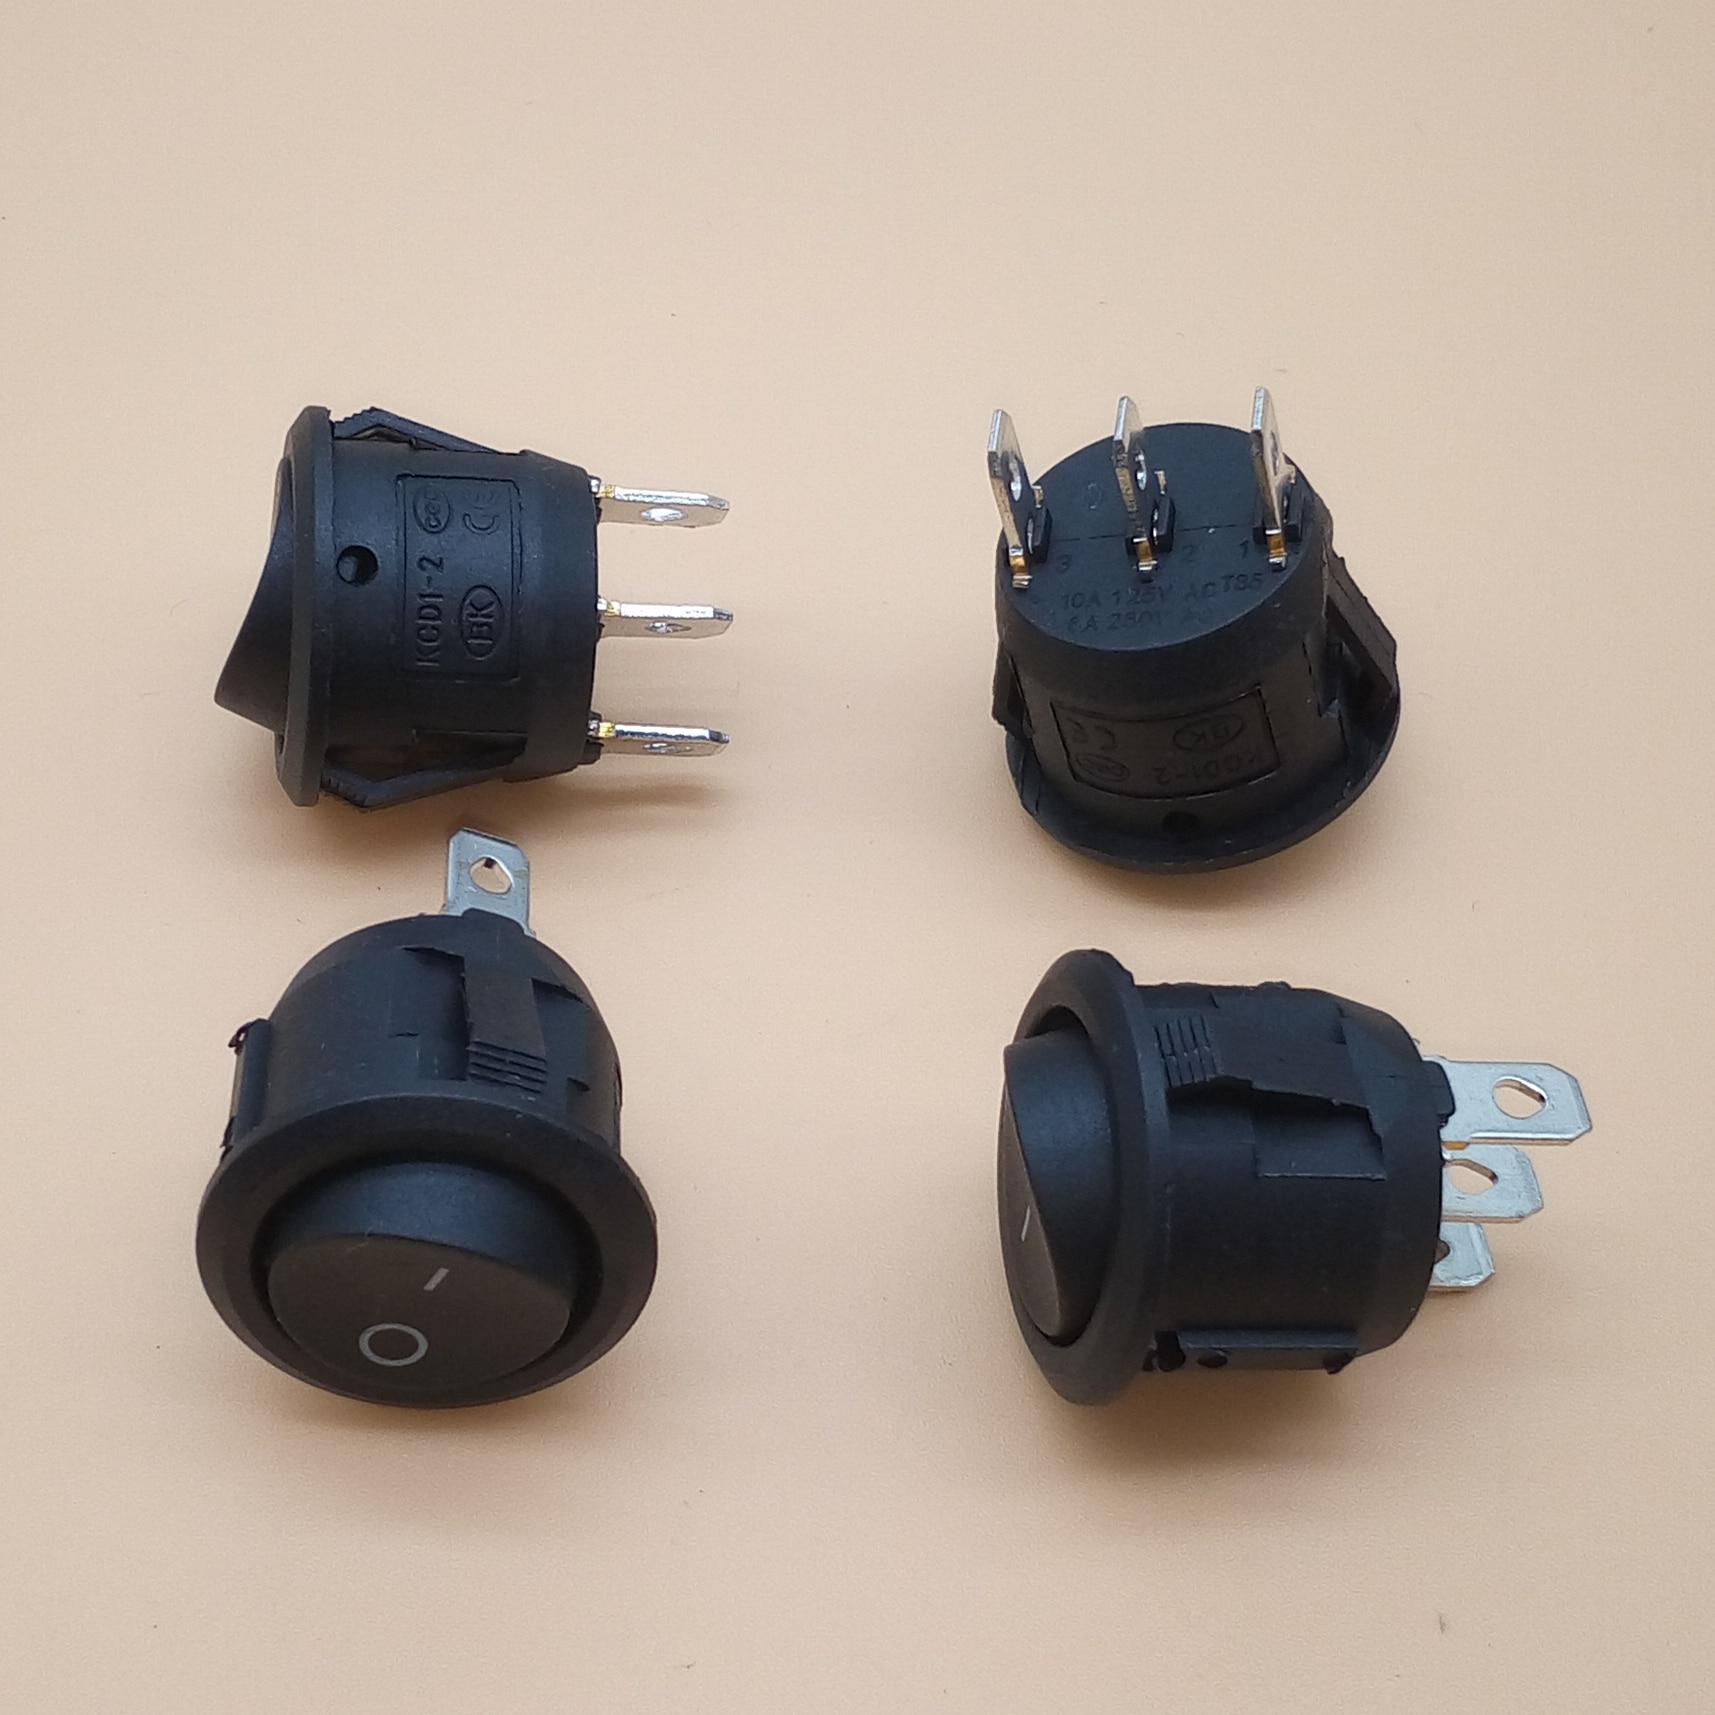 Pcs Mini Round Black 3 10 Pin SPDT ON-OFF Rocker Switch Snap-in KCD1-2 perfurar diâmetro 20mm